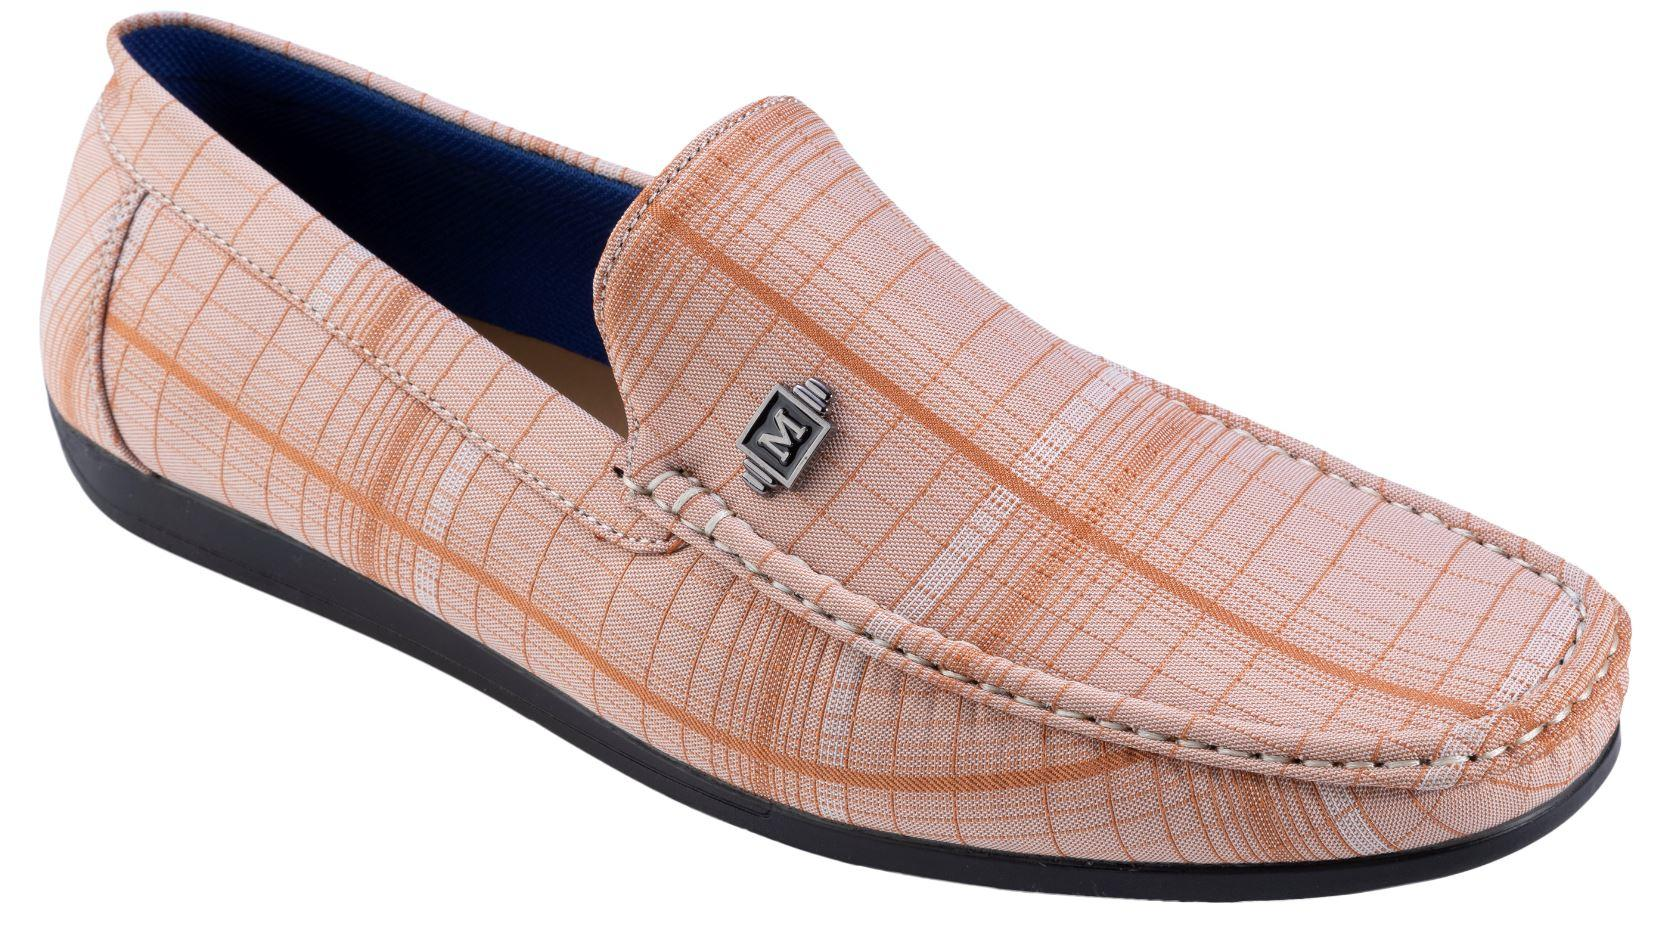 2105641d651 Montique S-1901 Men s Loafers - Mens Matching Shoes Caramel